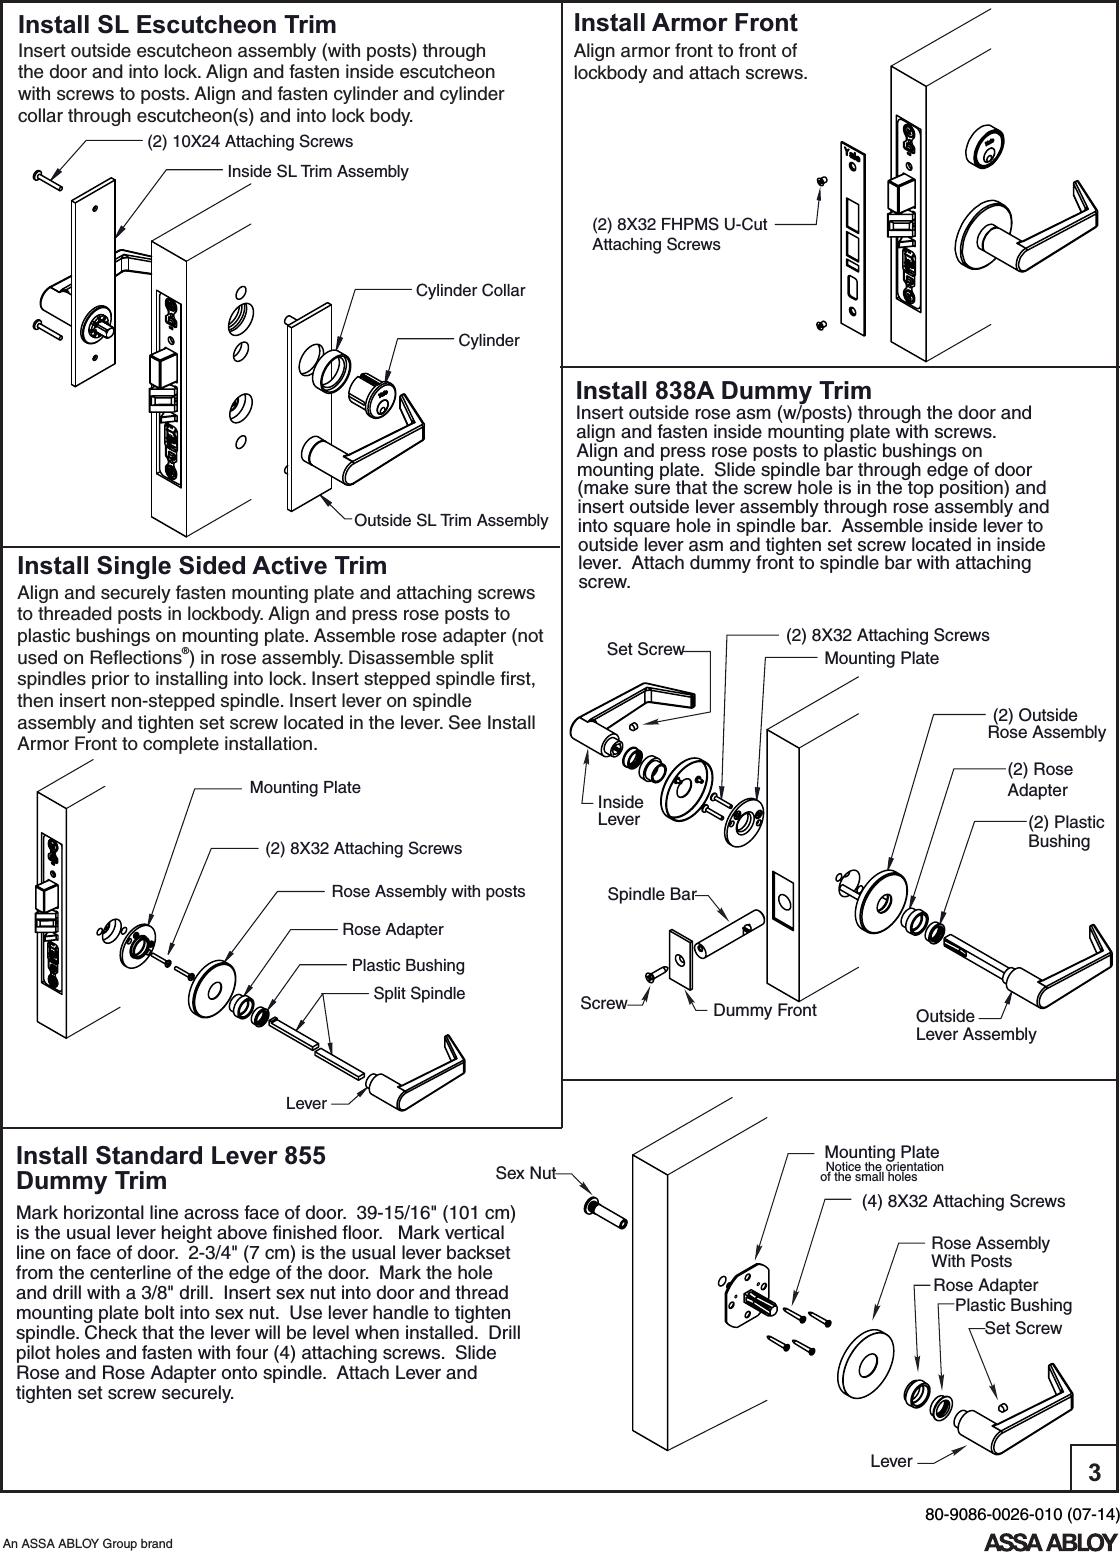 Servicing And Retrofitting Mortise Locks Manual Guide